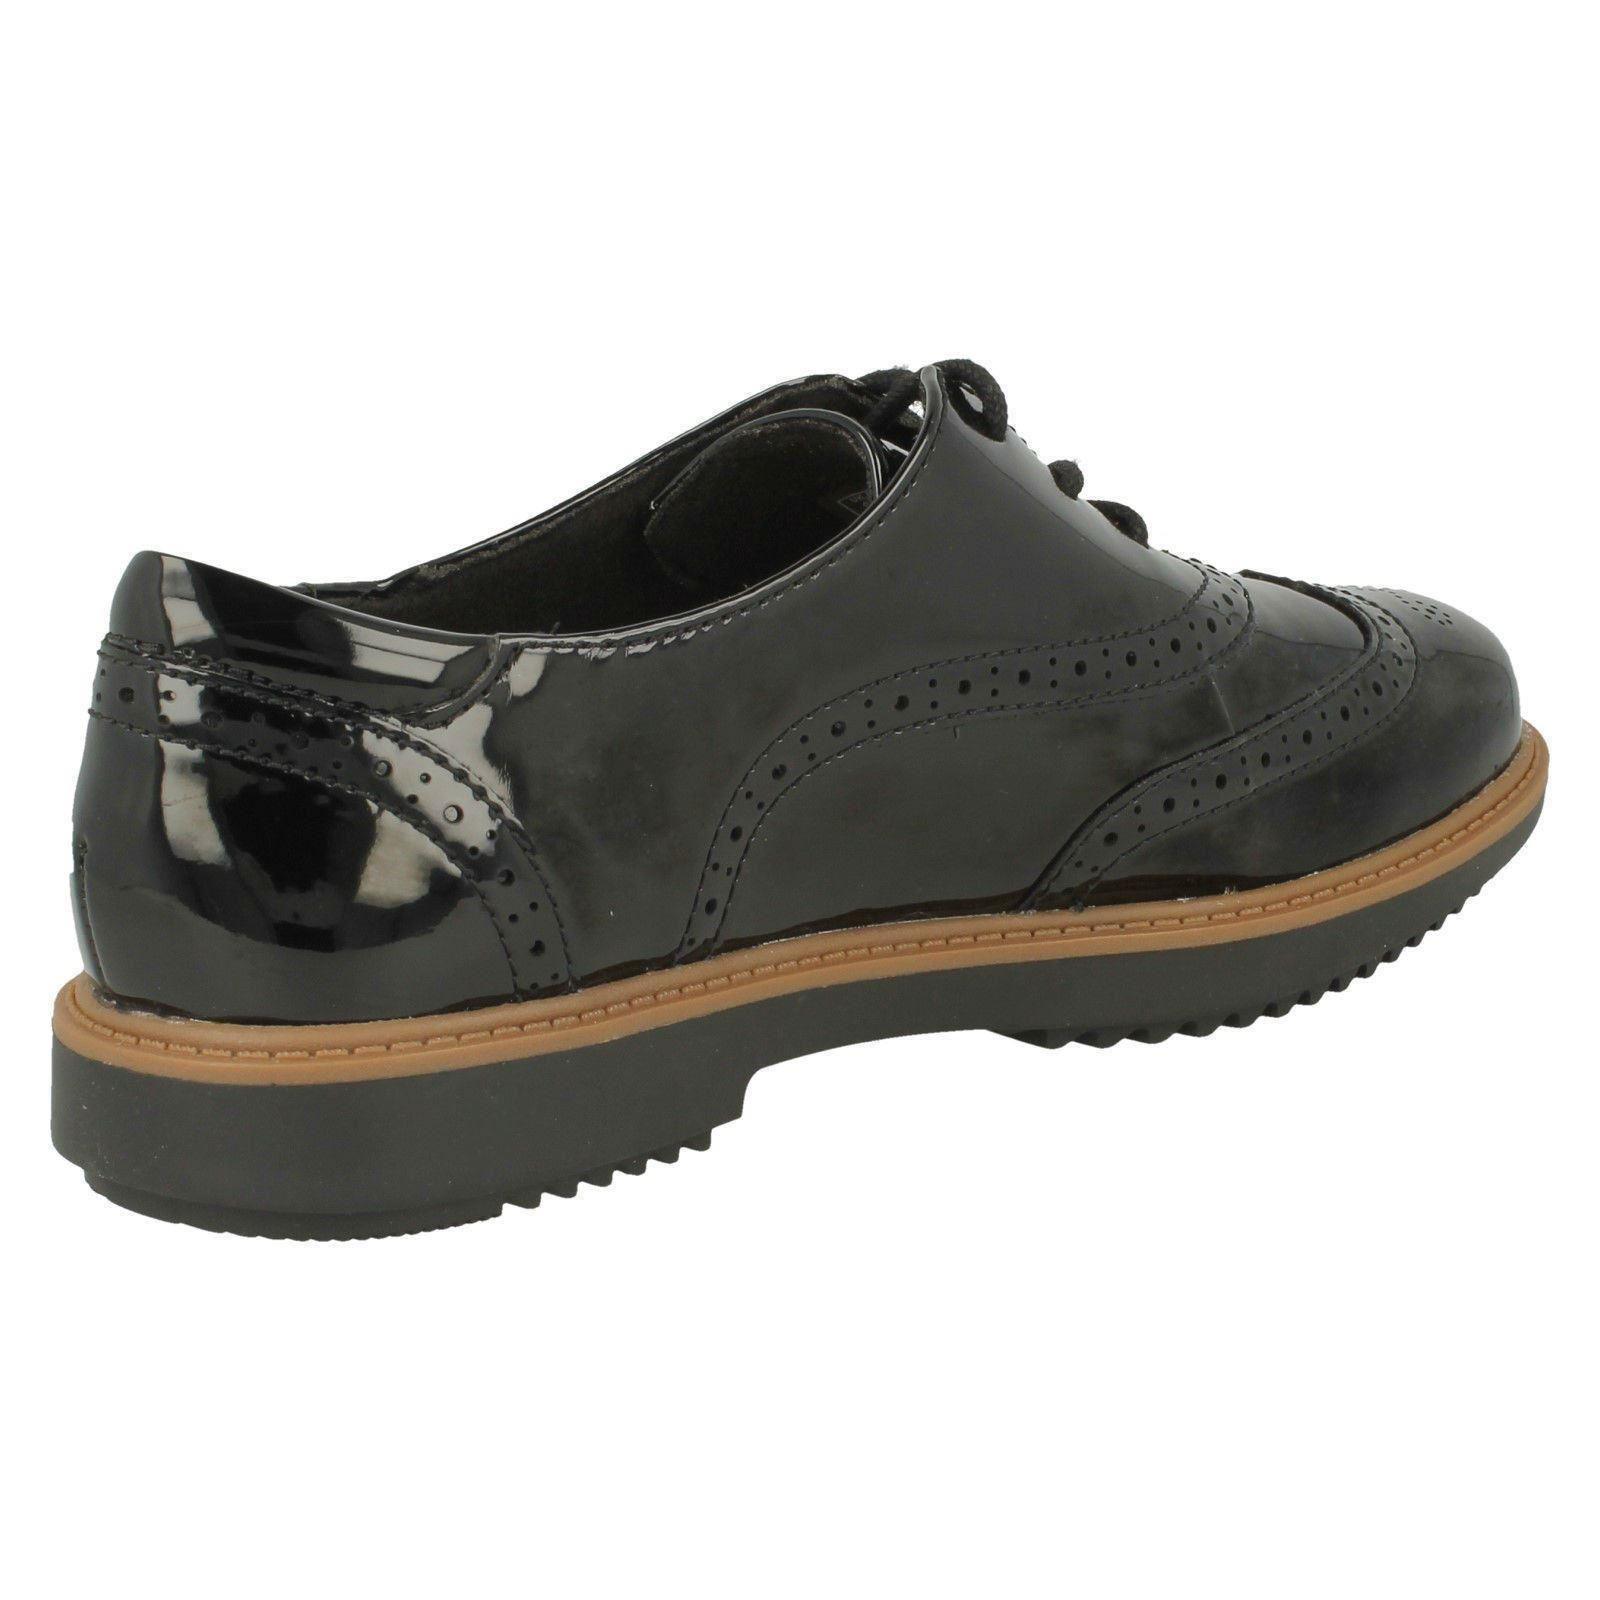 exterior desagradable Deformar  Ladies Clarks Brogue Shoes Raisie Hilde | eBay